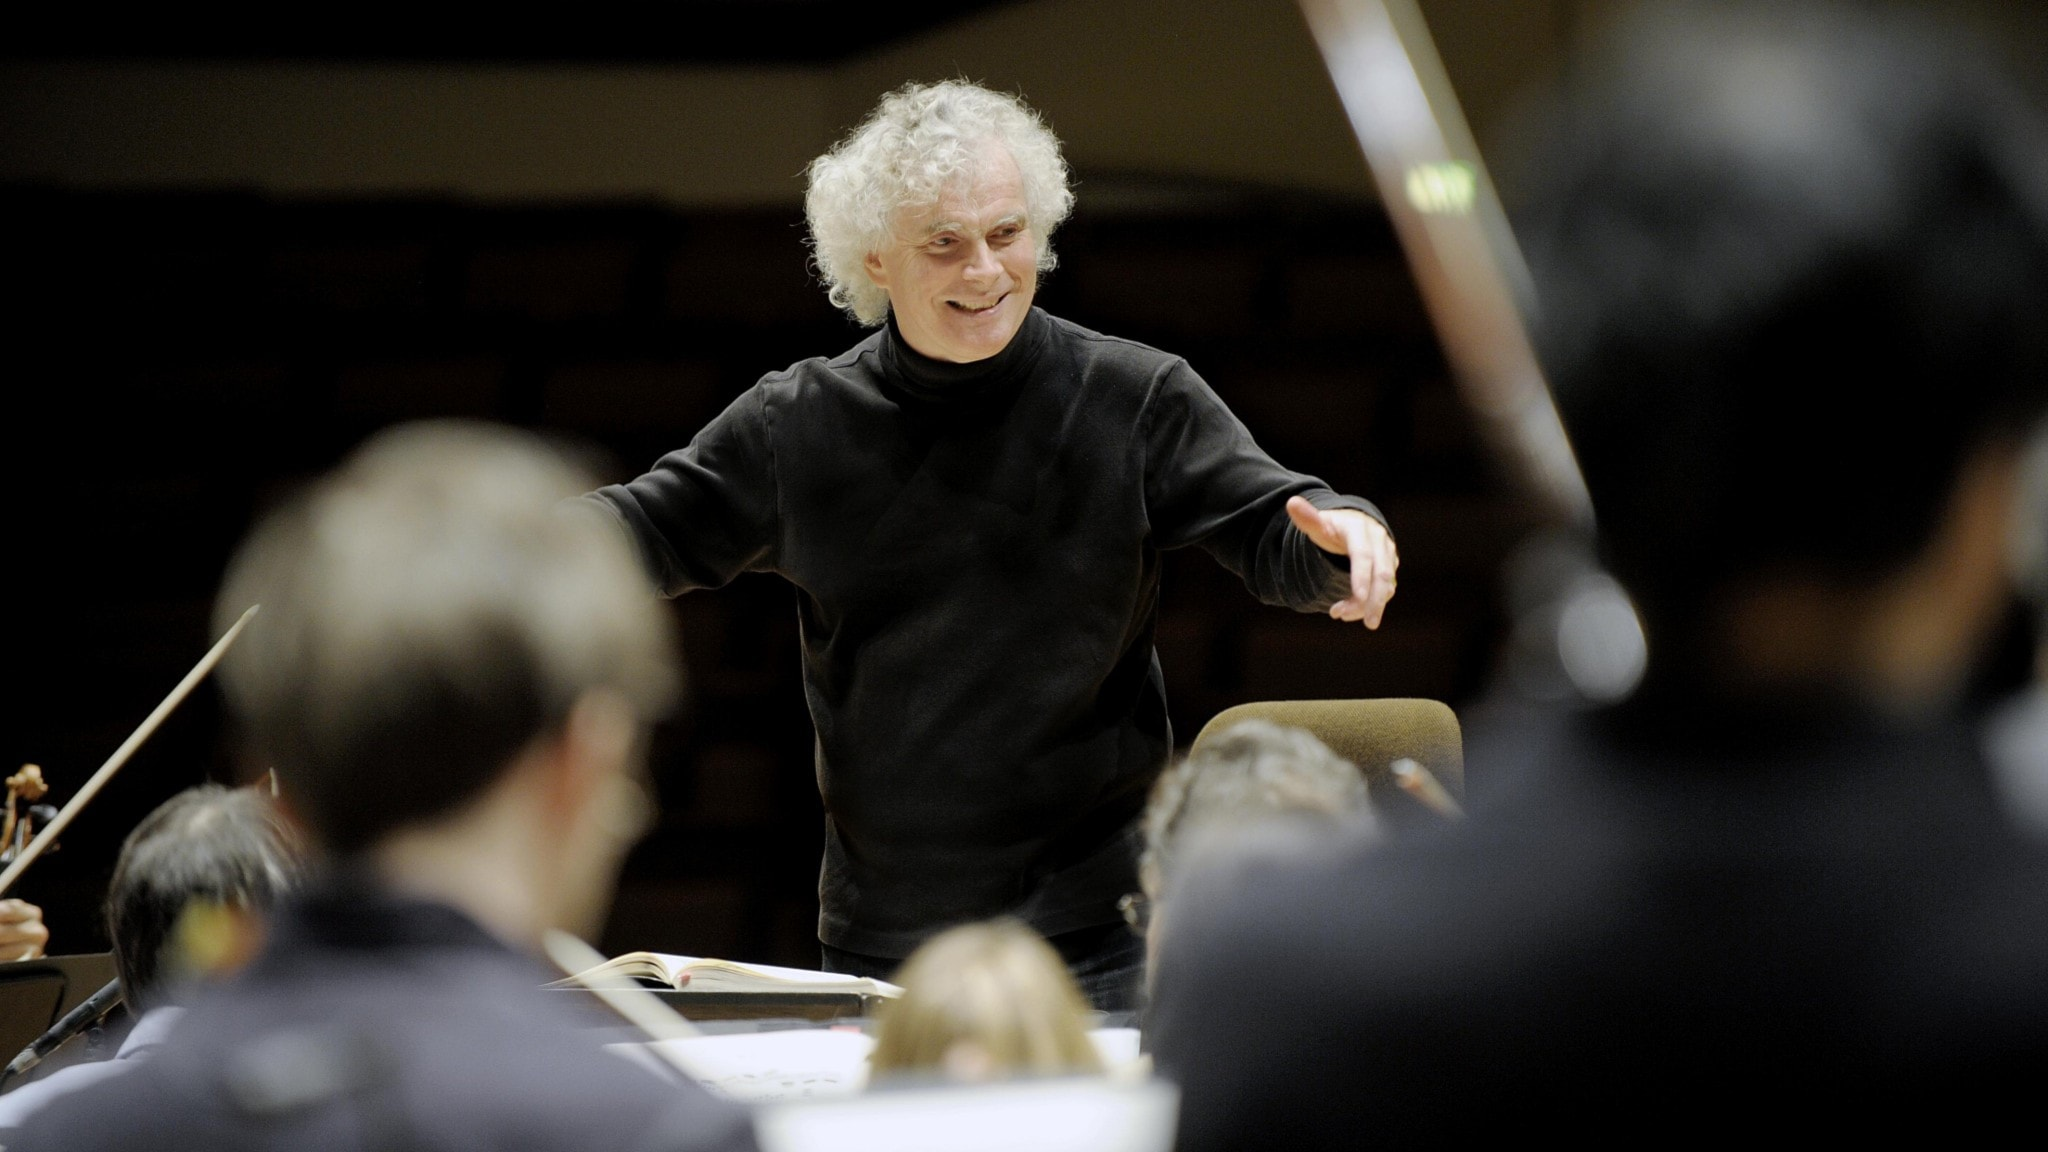 KONSERT: Simon Rattle dirigerar Londons symfoniorkester